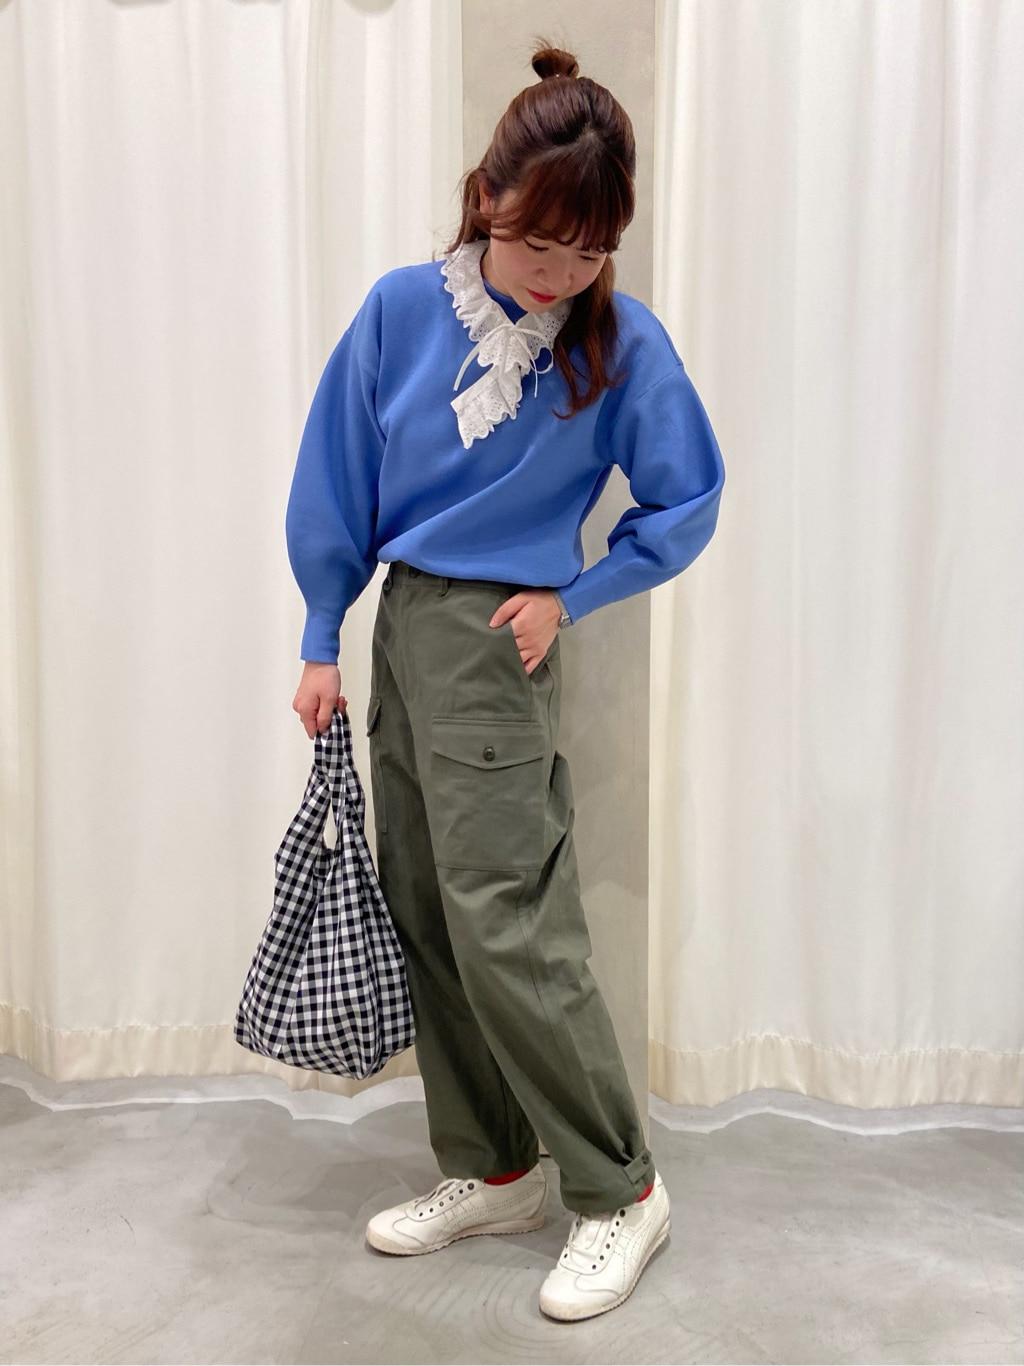 - CHILD WOMAN CHILD WOMAN , PAR ICI 東京スカイツリータウン・ソラマチ 身長:165cm 2021.02.17